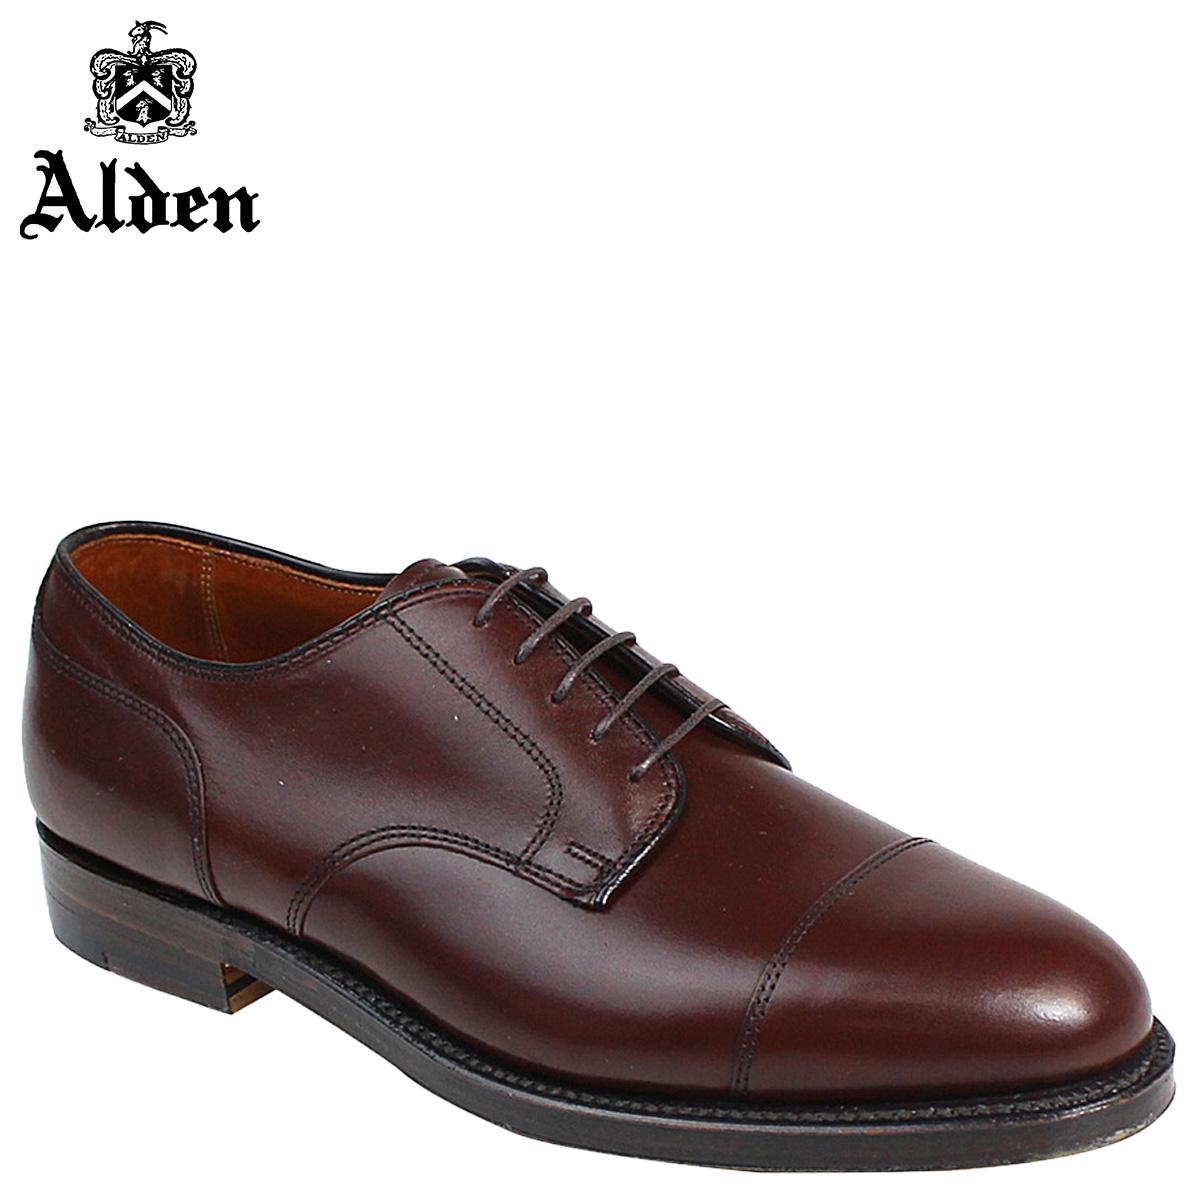 ALDEN オールデン シューズ STRAIGHT TIP BLUCHER Dワイズ 972 メンズ